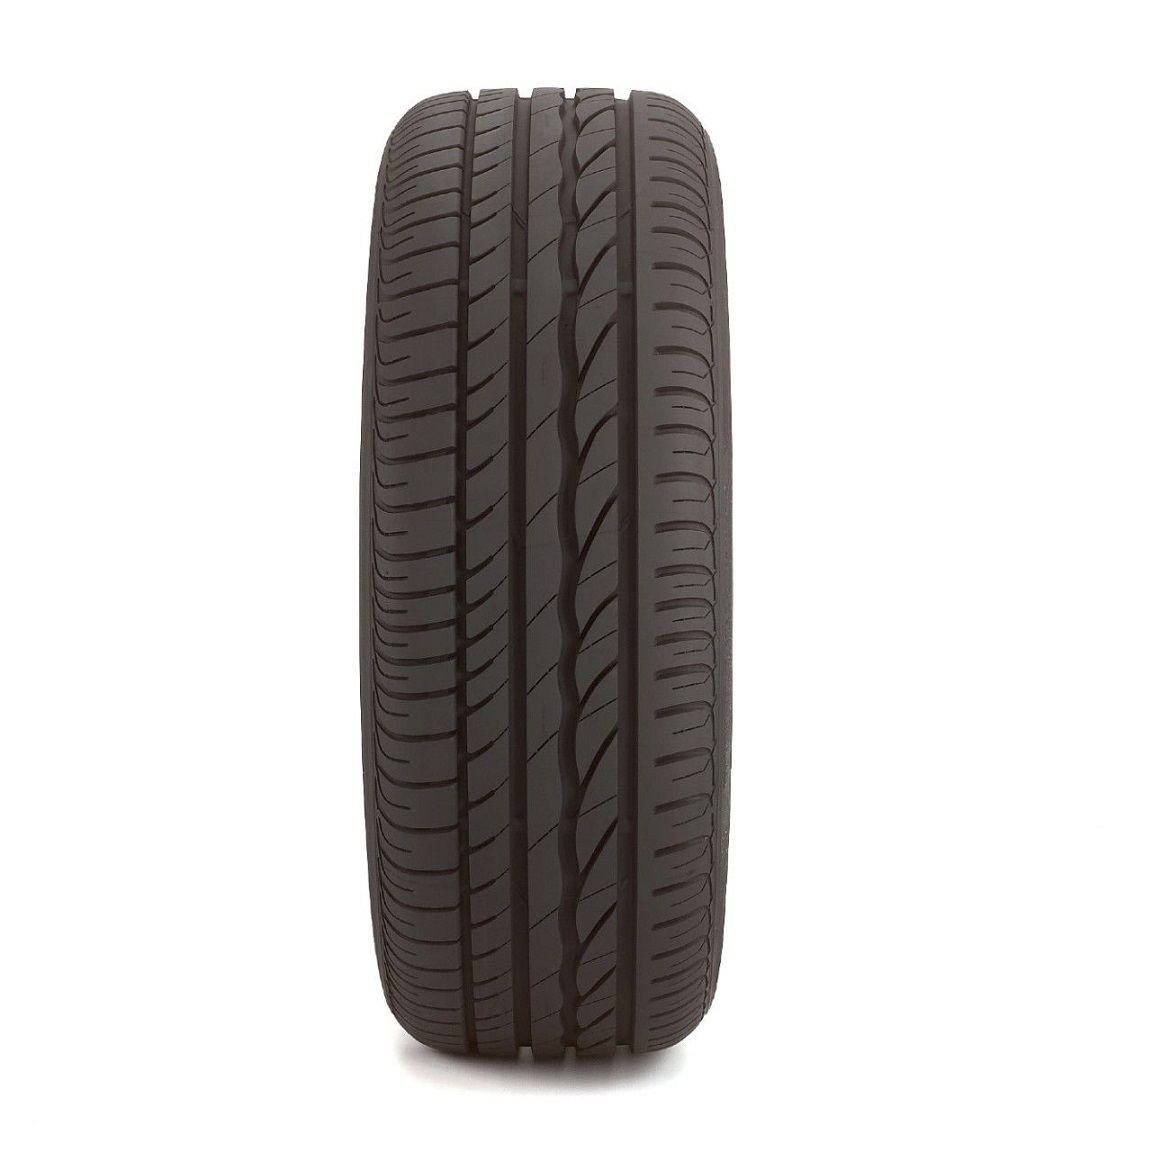 Pneu 205/55 R 16 - Turanza Er300 Rft 91v - Bridgestone